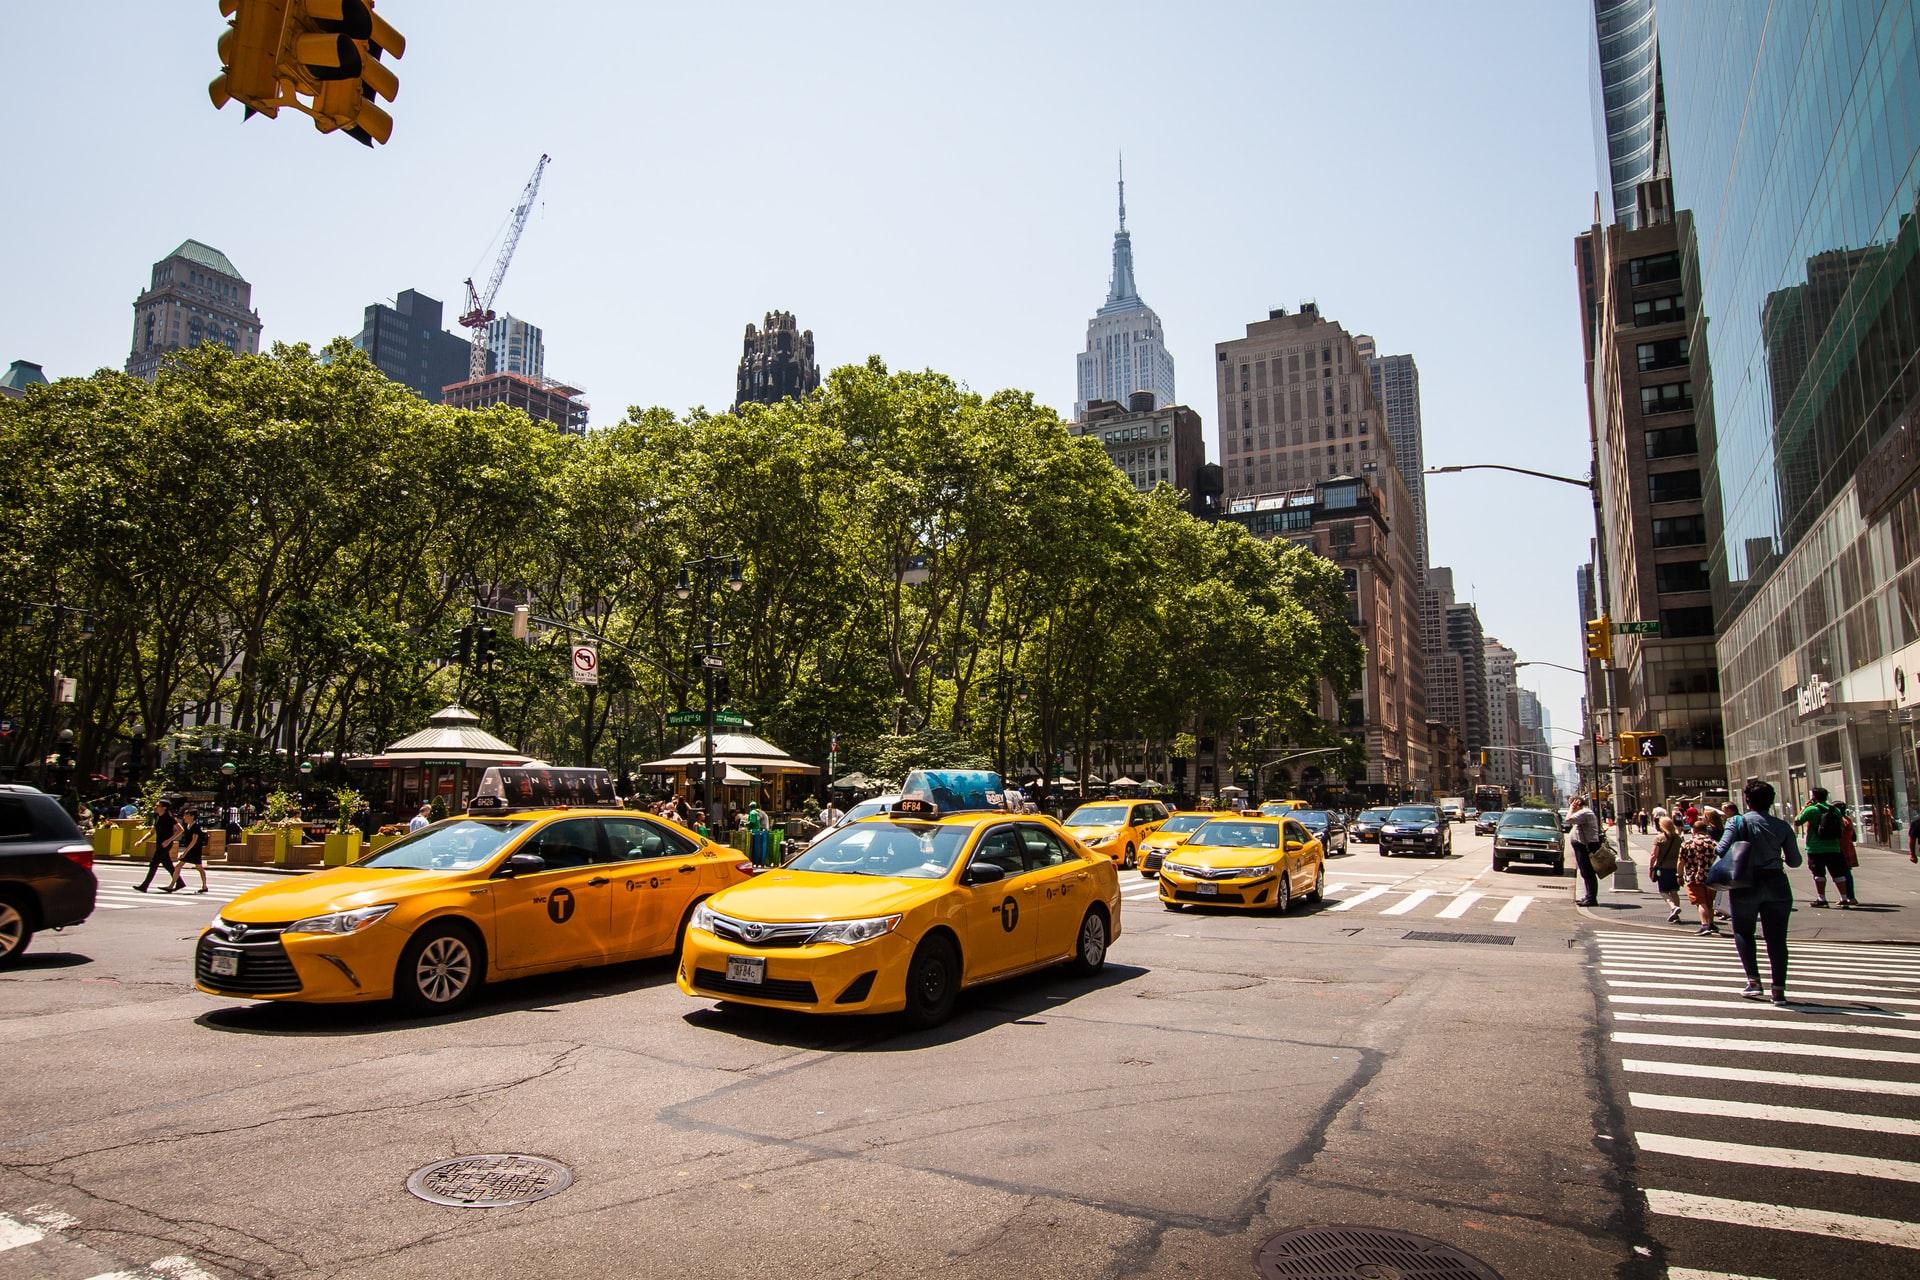 cab-street-new-york